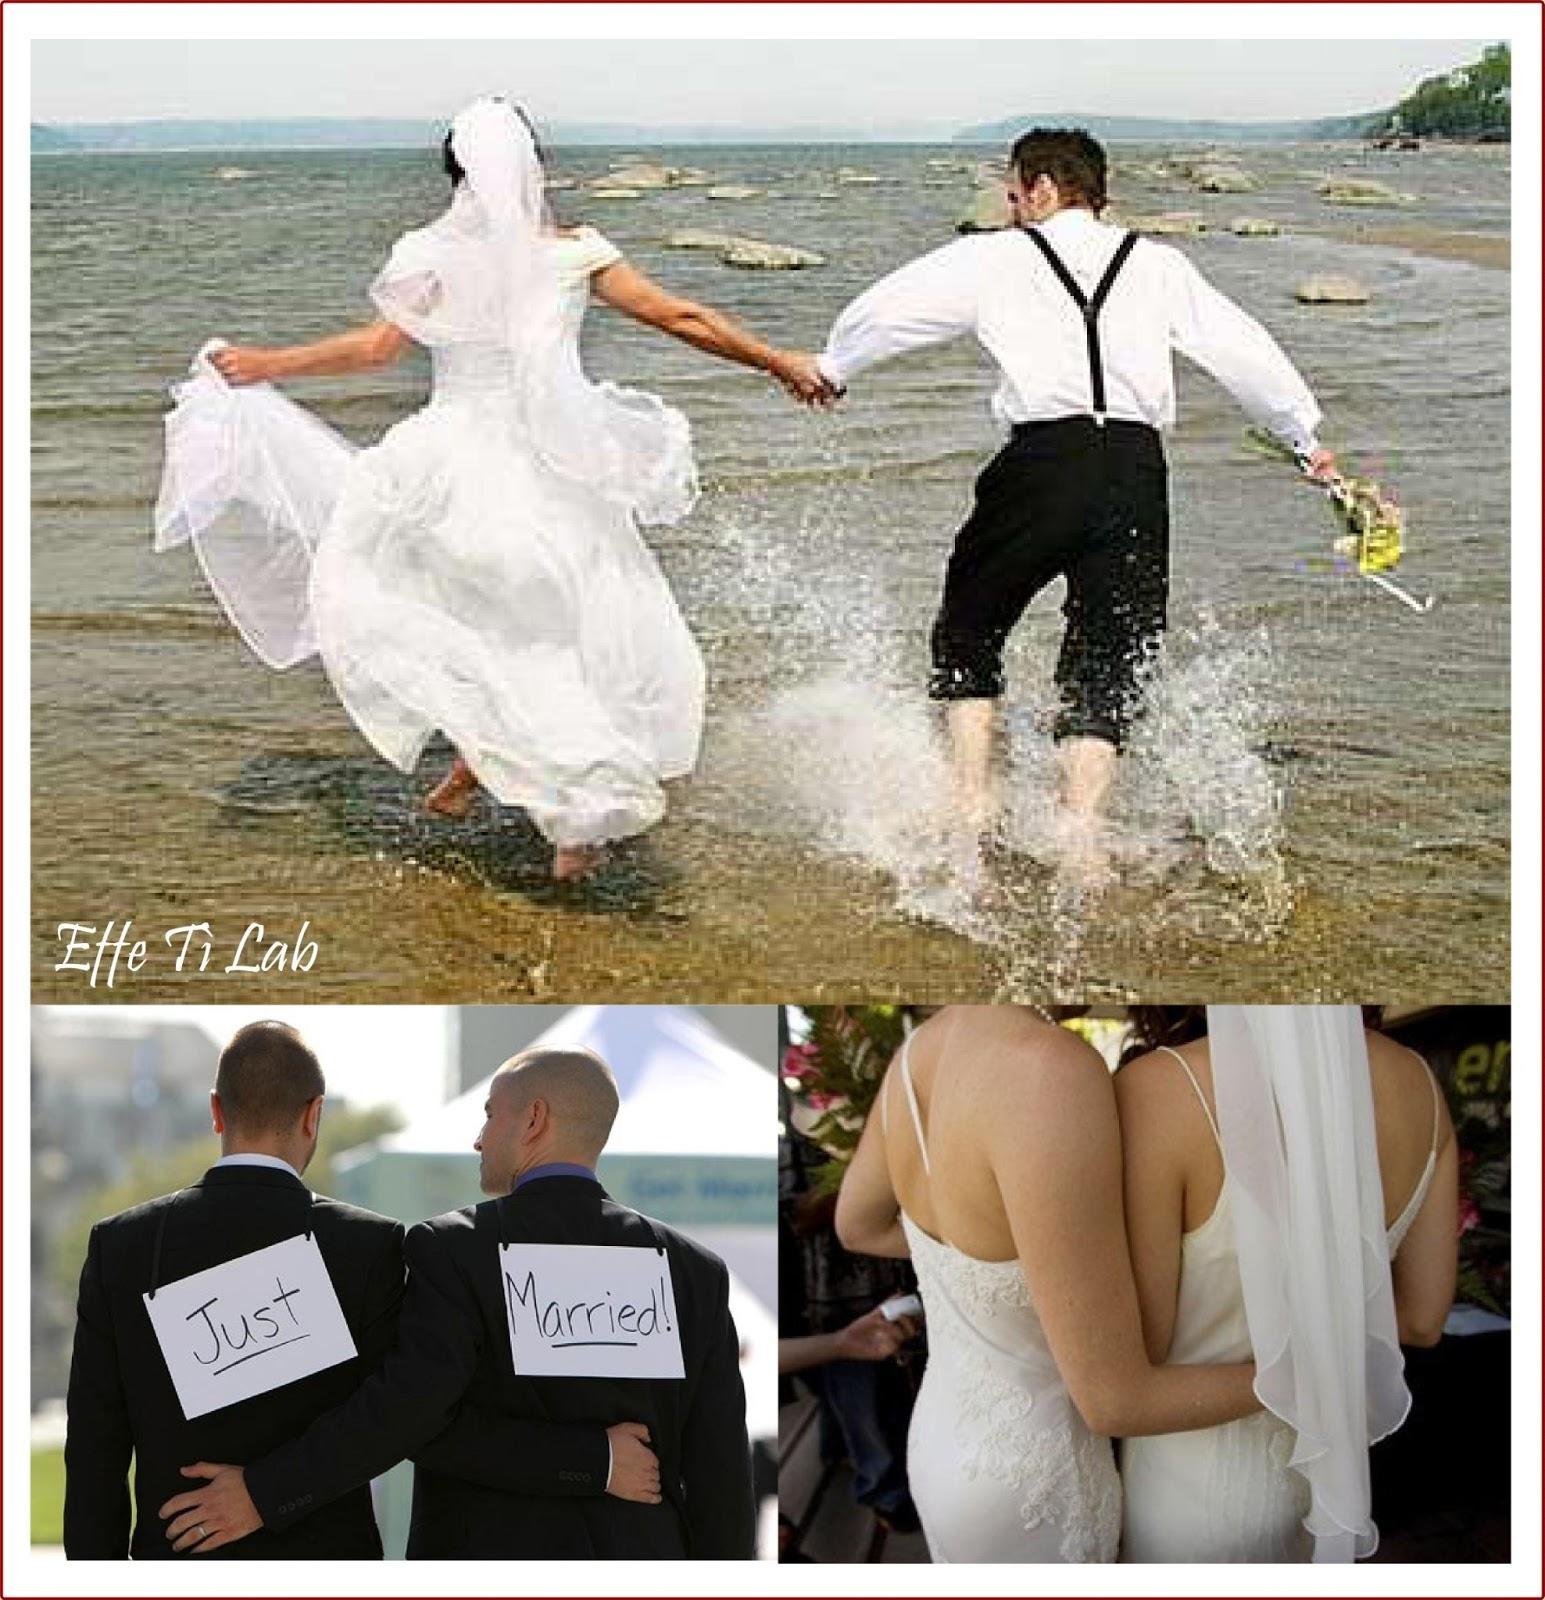 Matrimonio Simbolico Promesse : Effe ti lab wedding and events planner: la poesia del matrimonio